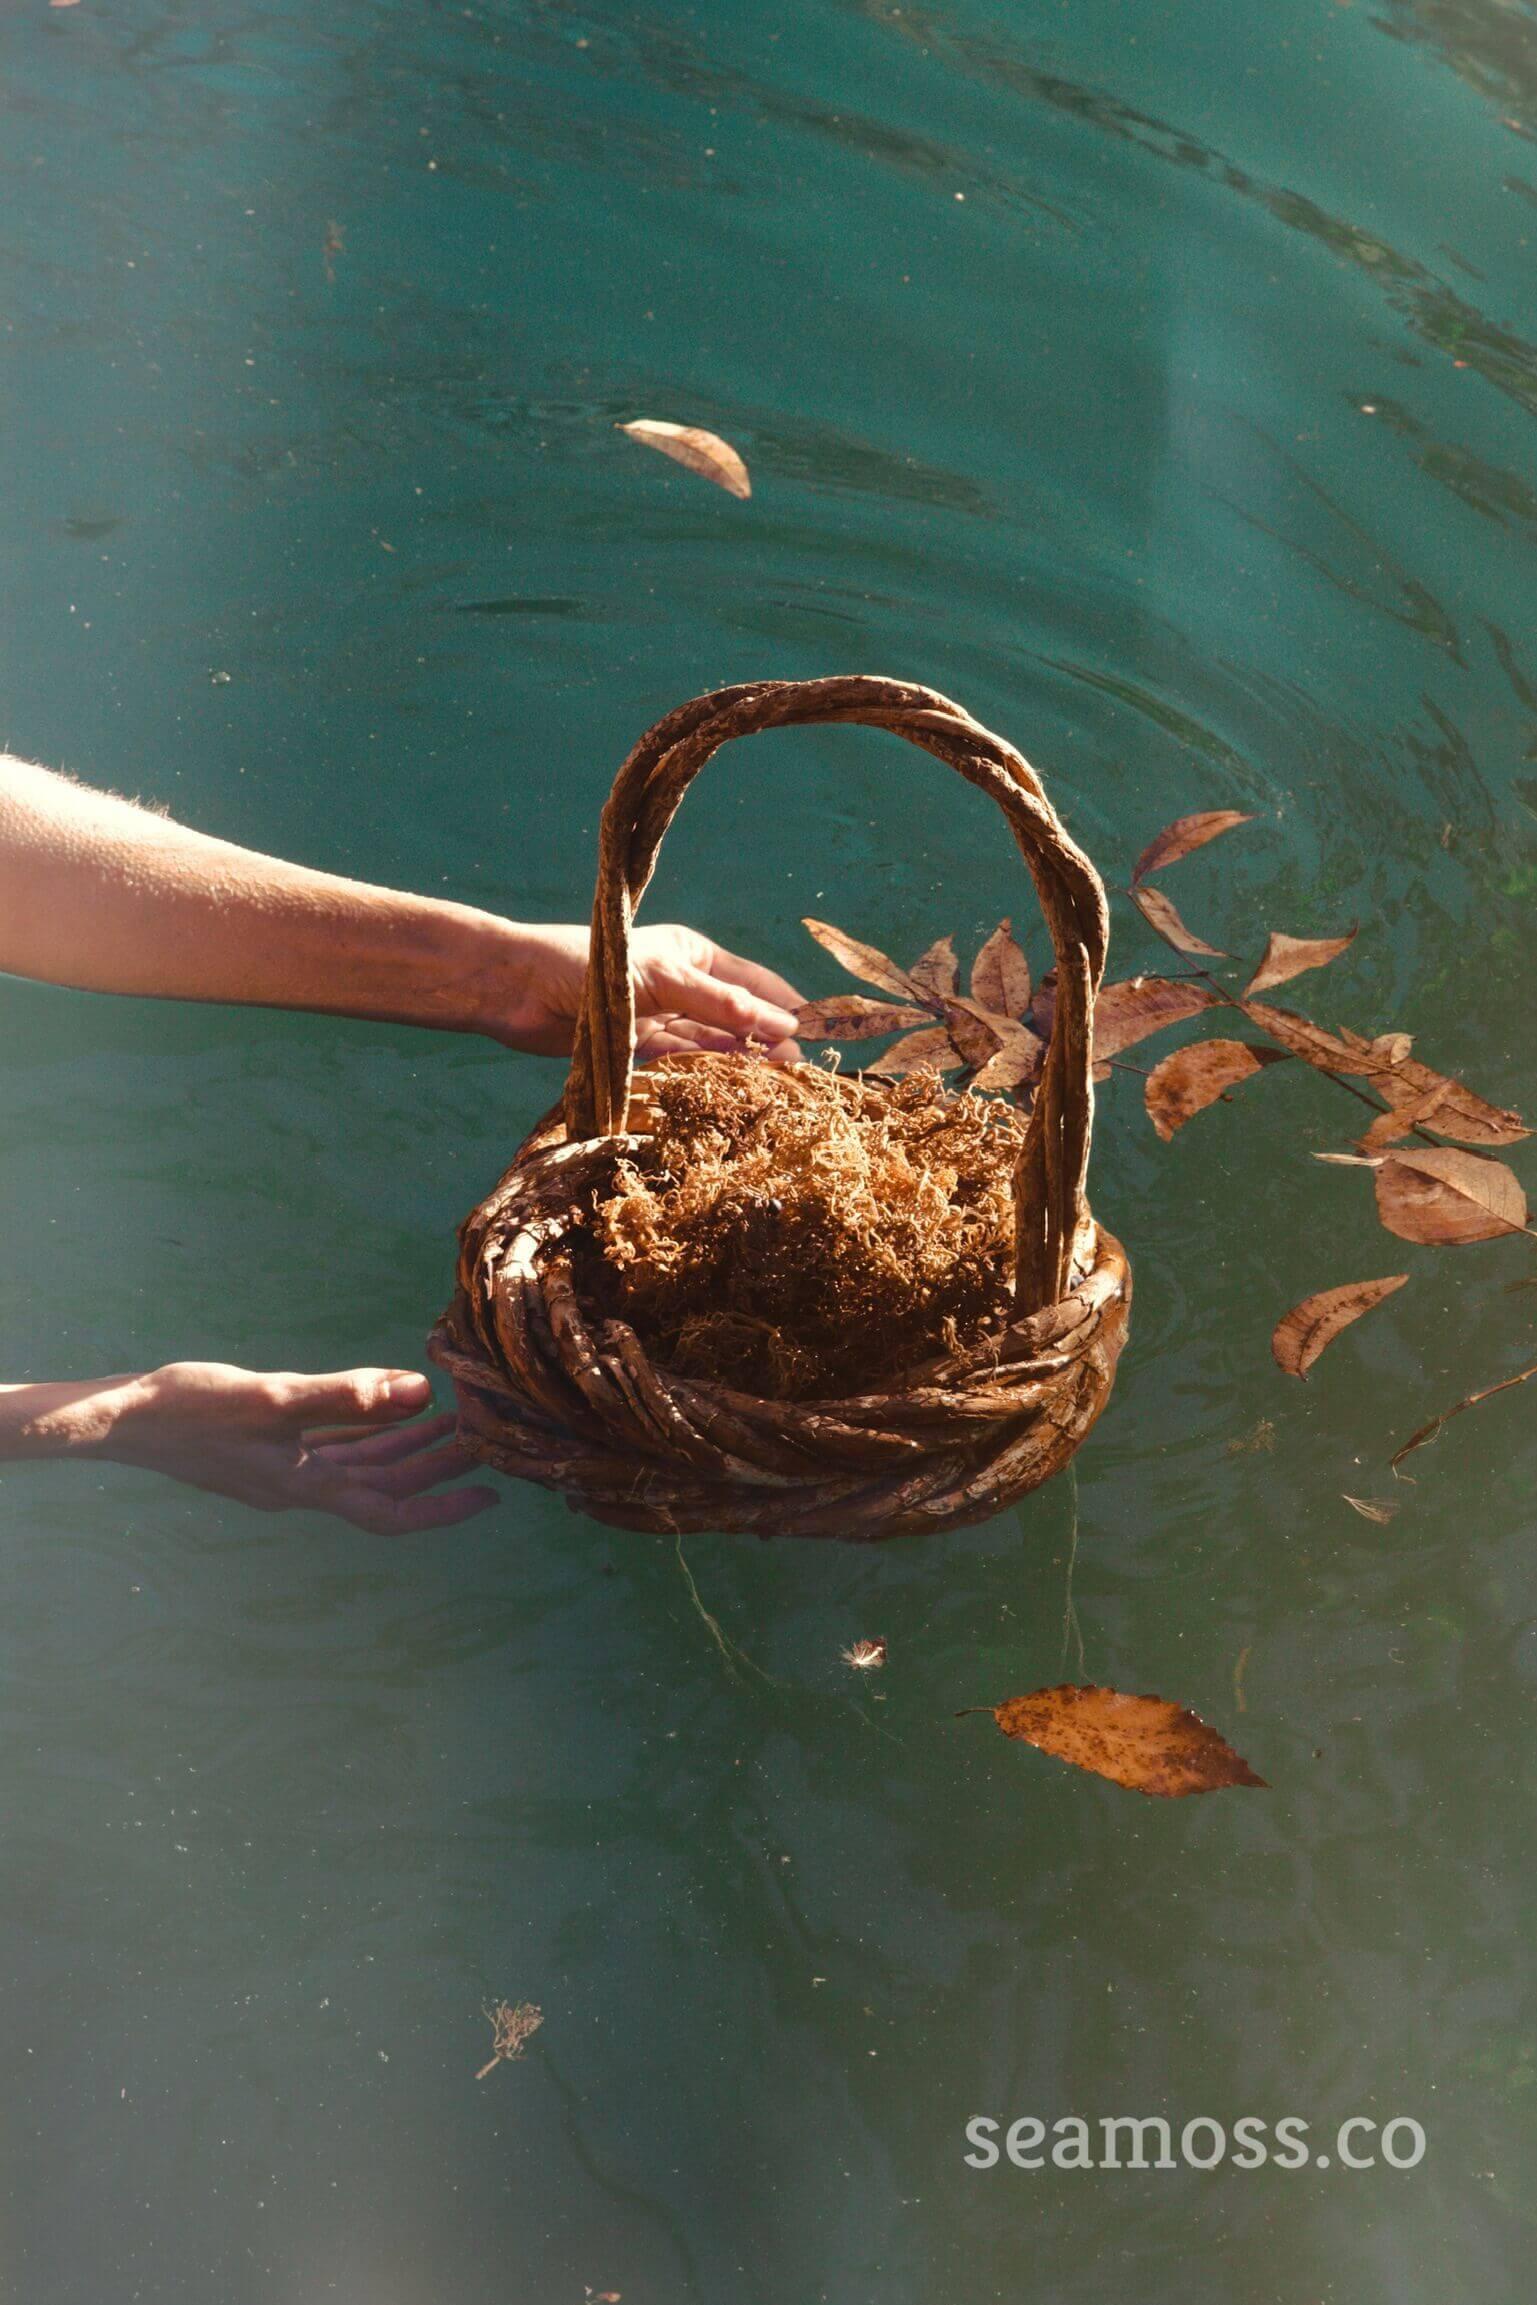 Basket of sea moss in Barton Springs